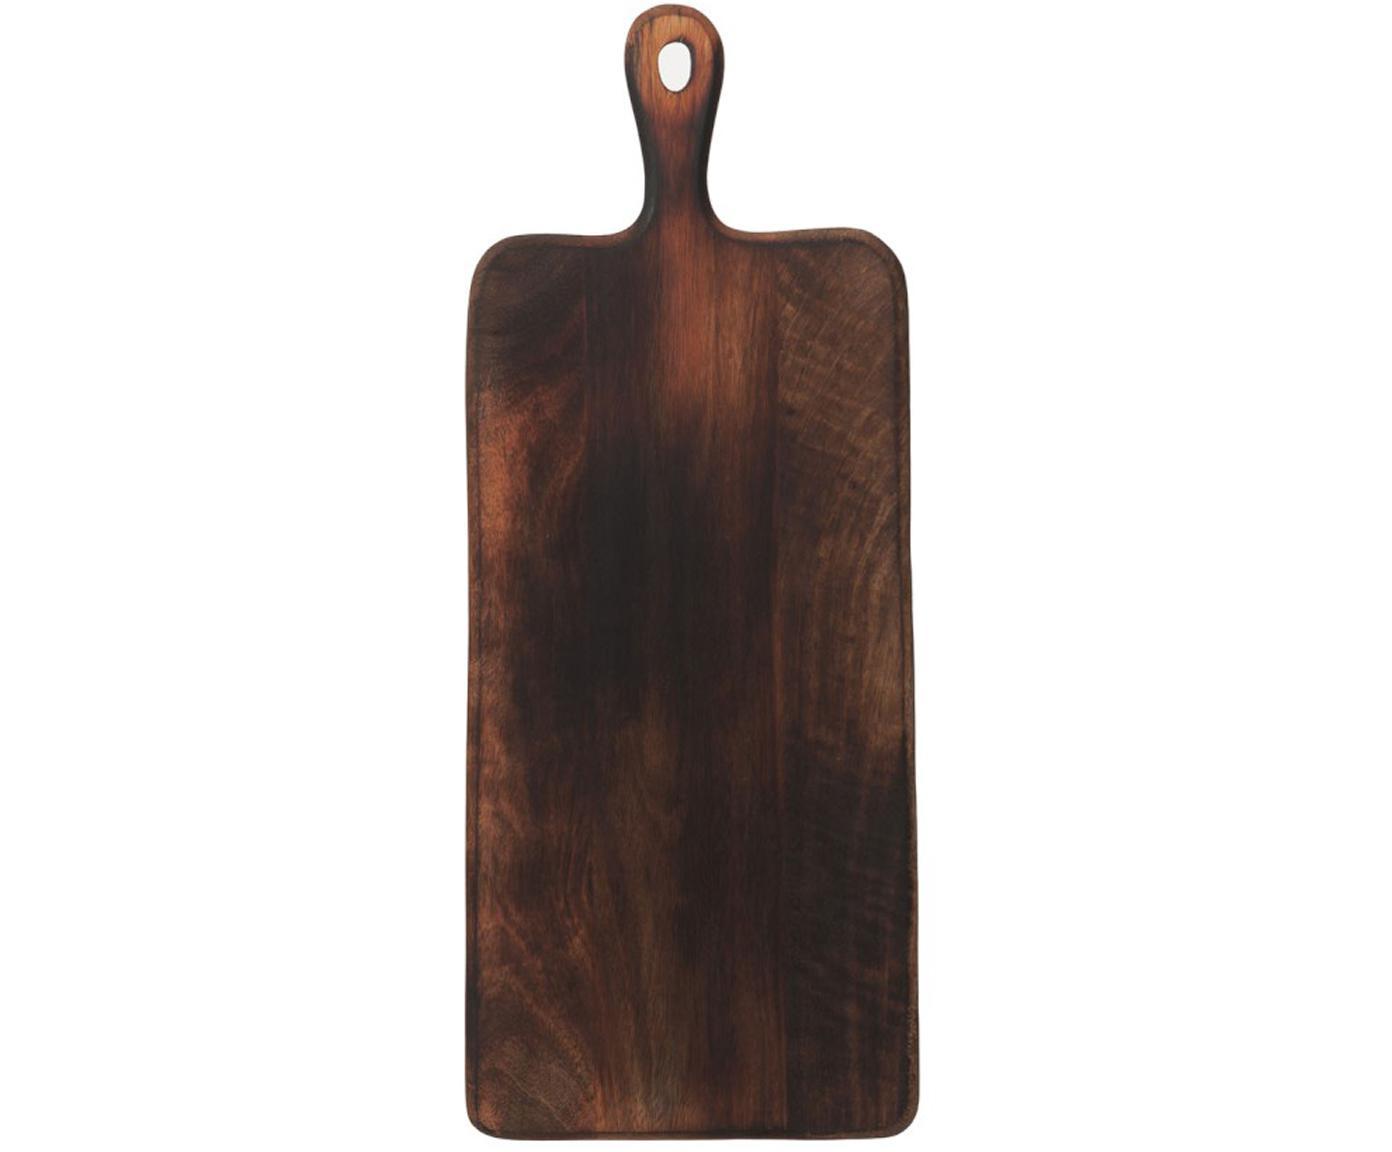 Deska do krojenia Branek, Drewno naturalne, Ciemny brązowy, S 50 x W 1 cm